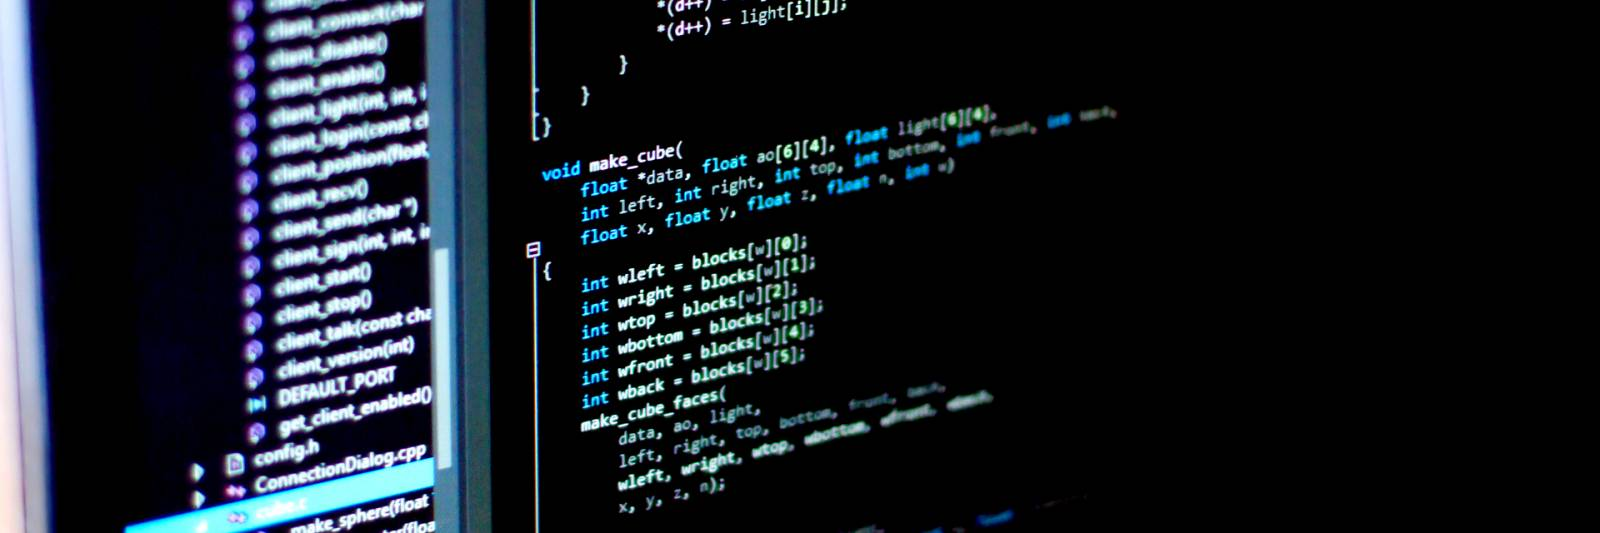 github bug saw users logged into others users' accounts